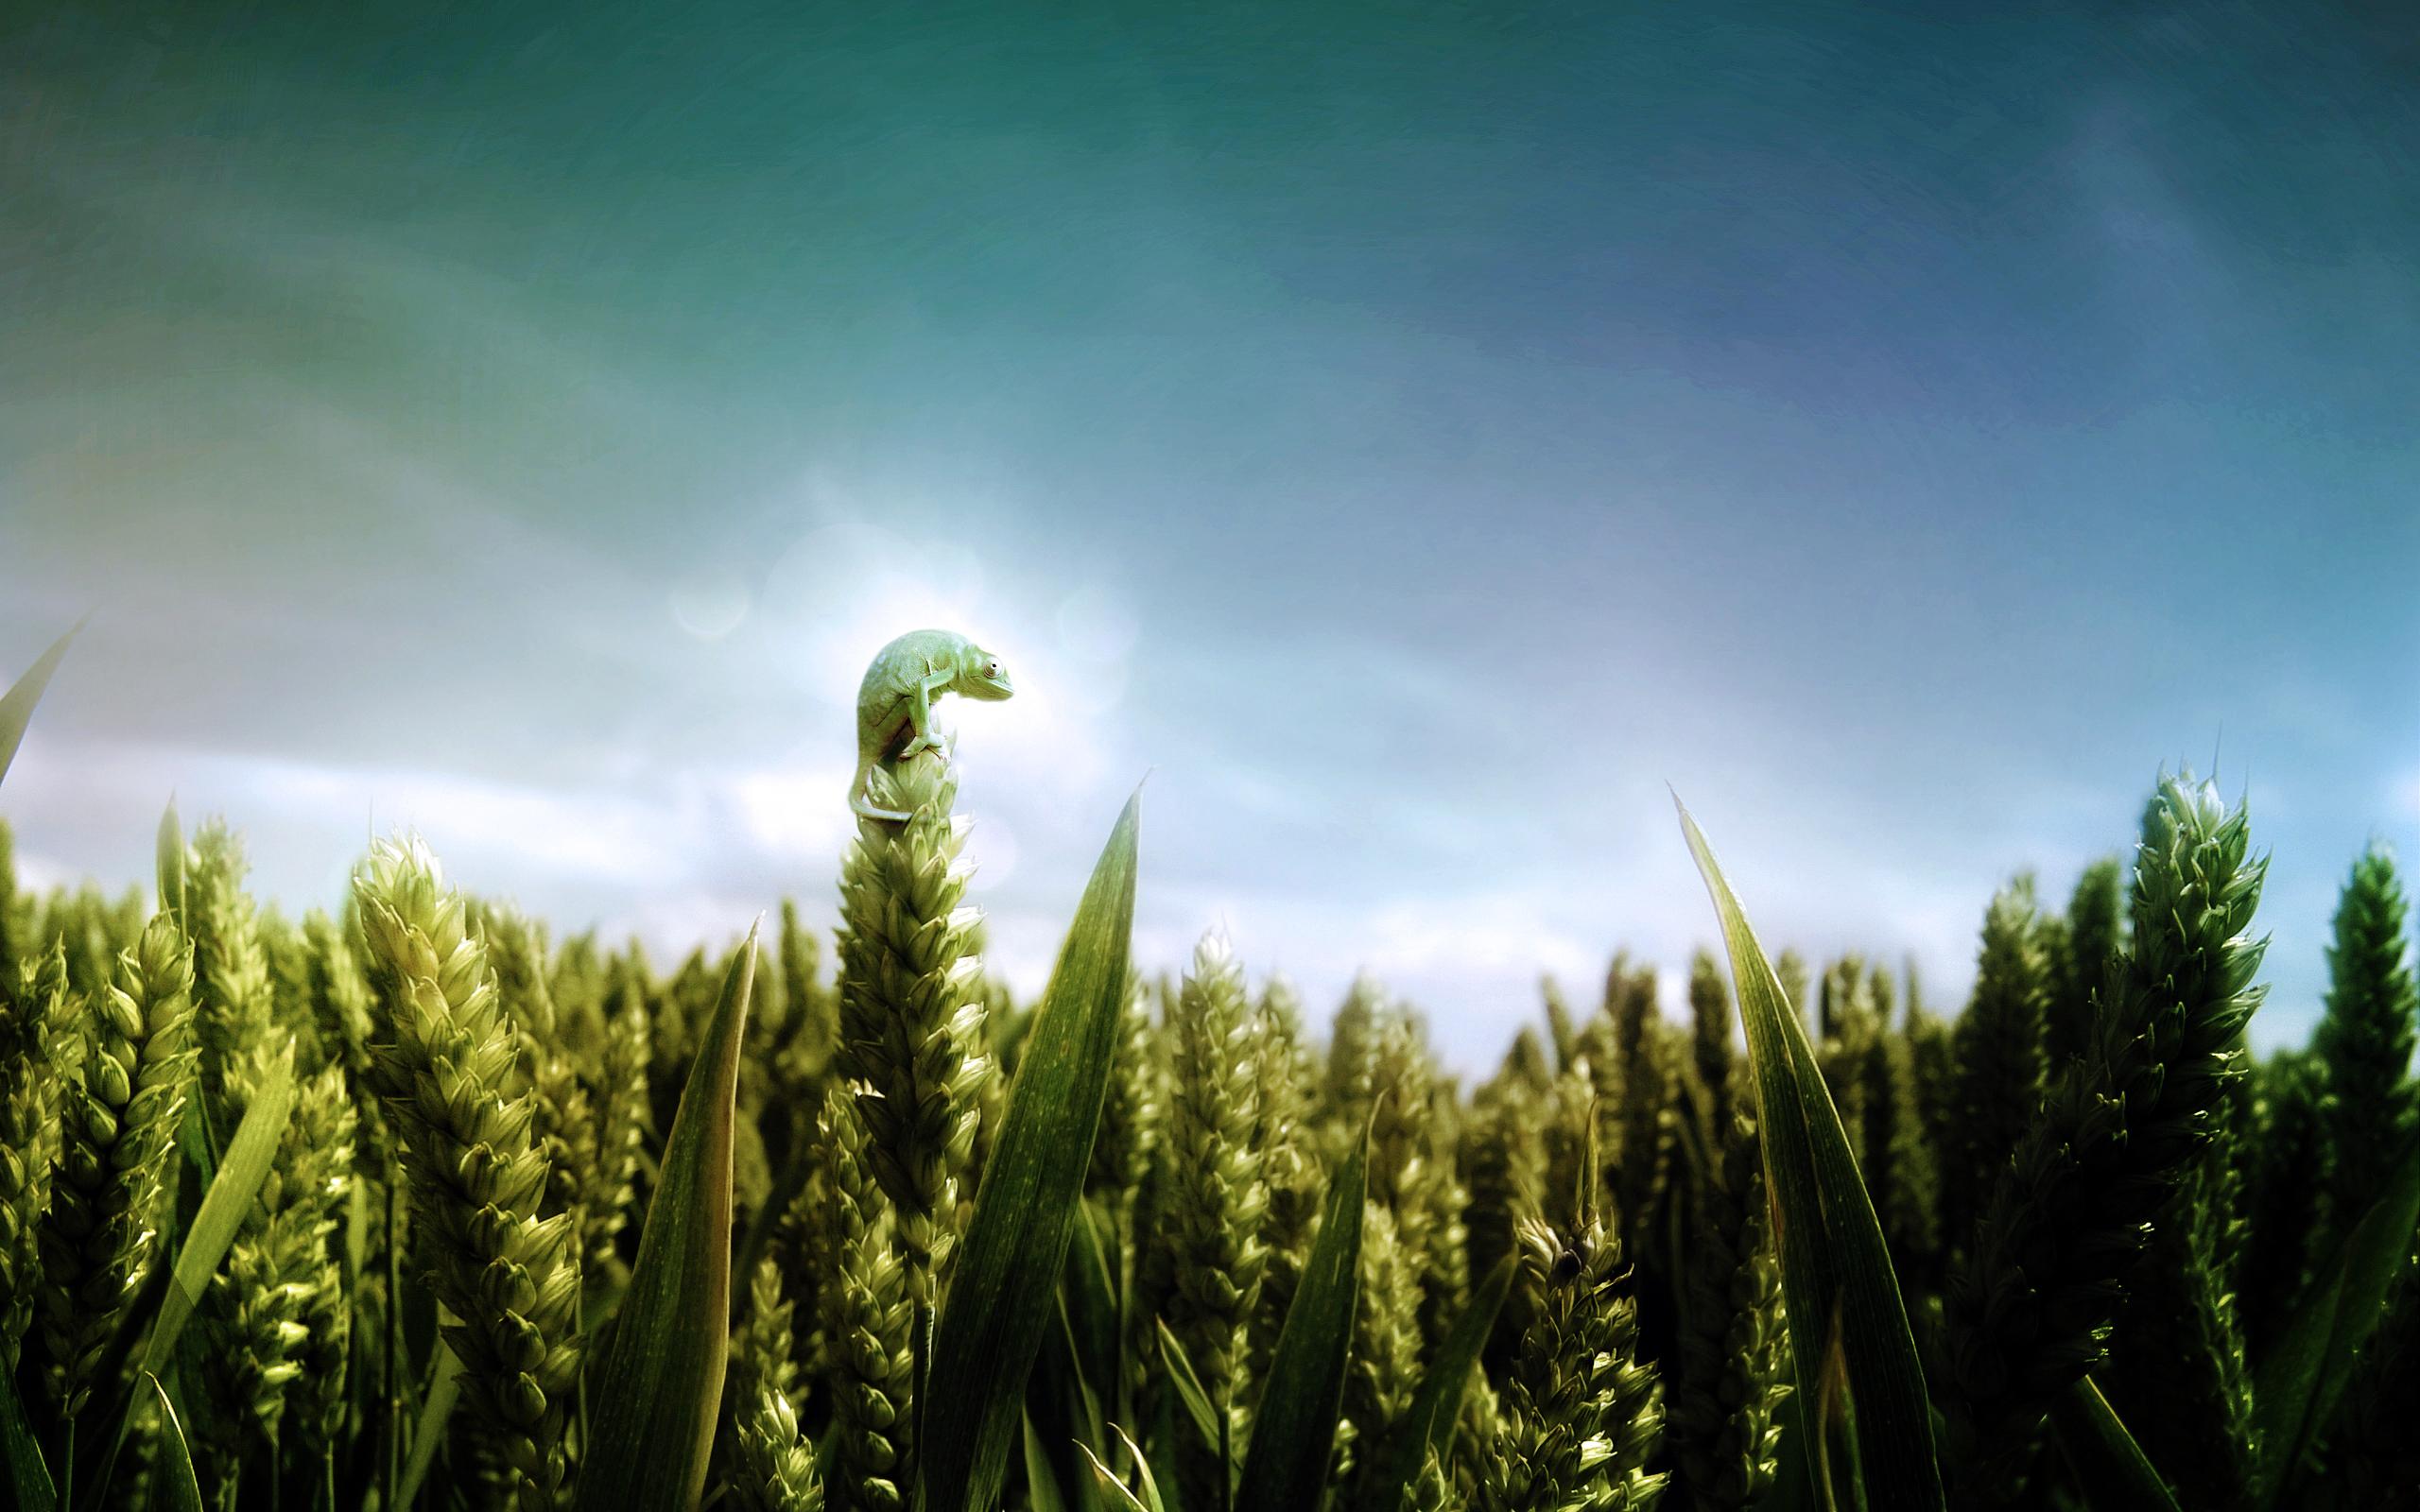 Chameleons-Fields-Skyscapes-wallpaper-wp424435-1